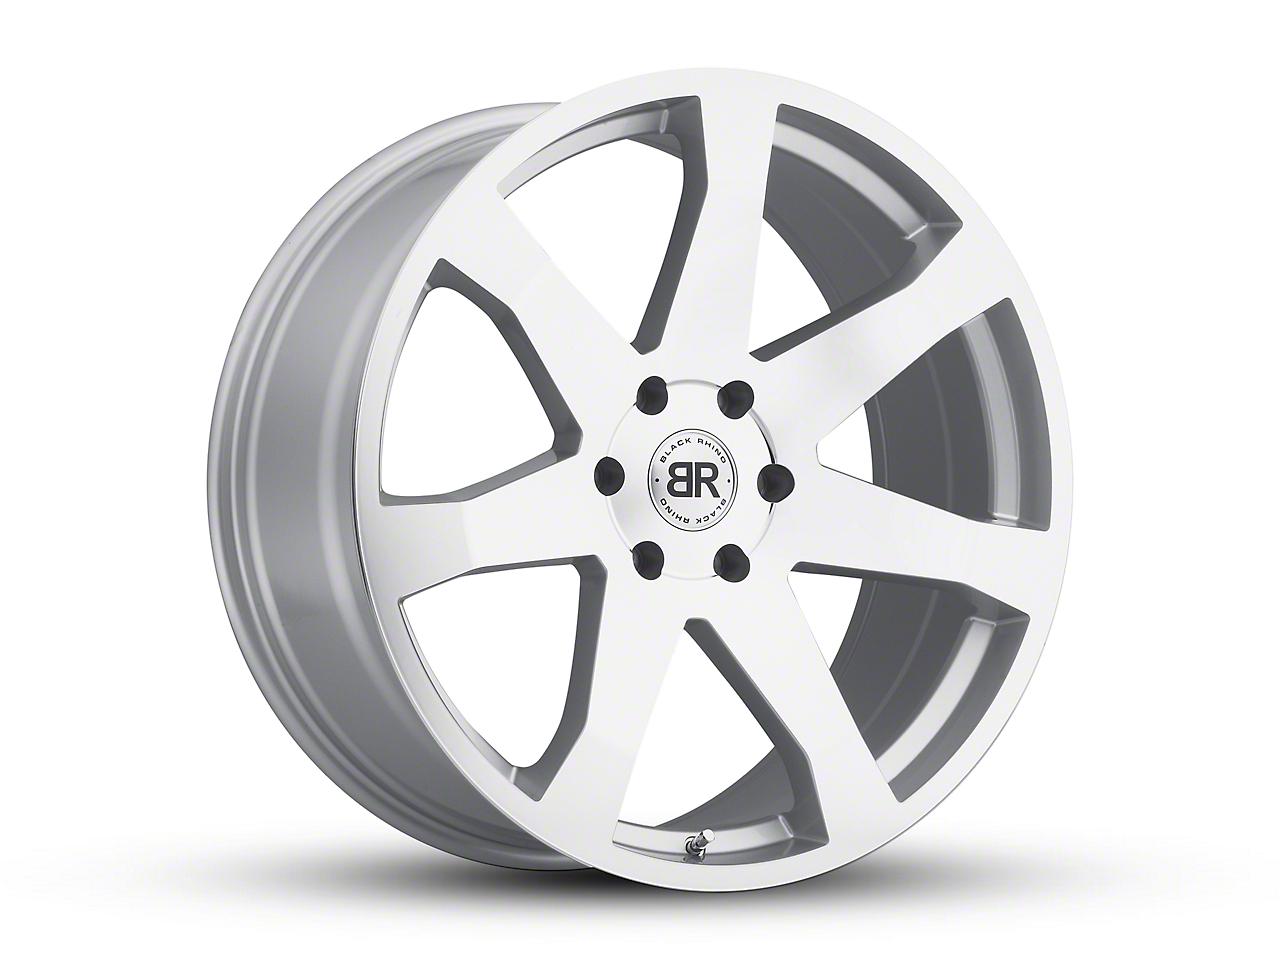 Black Rhino Mozambique Silver Wheels (07-18 Jeep Wrangler JK; 2018 Jeep Wrangler JL)